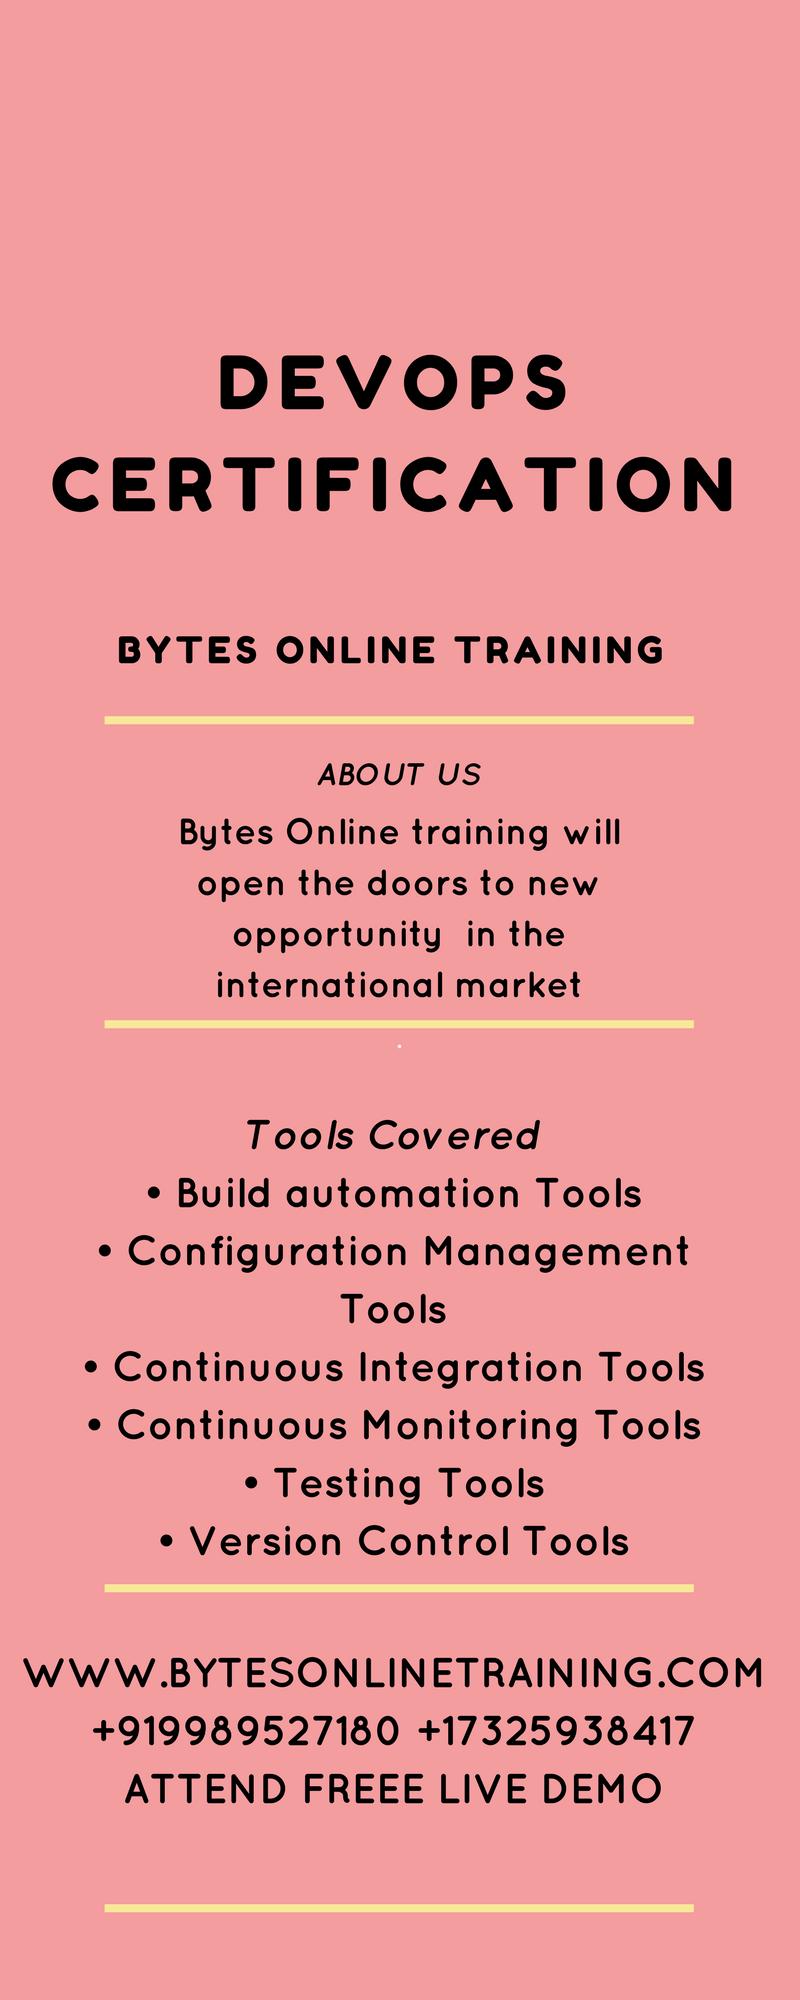 DevOps online training in Hyderabad[In-depth Knowledge